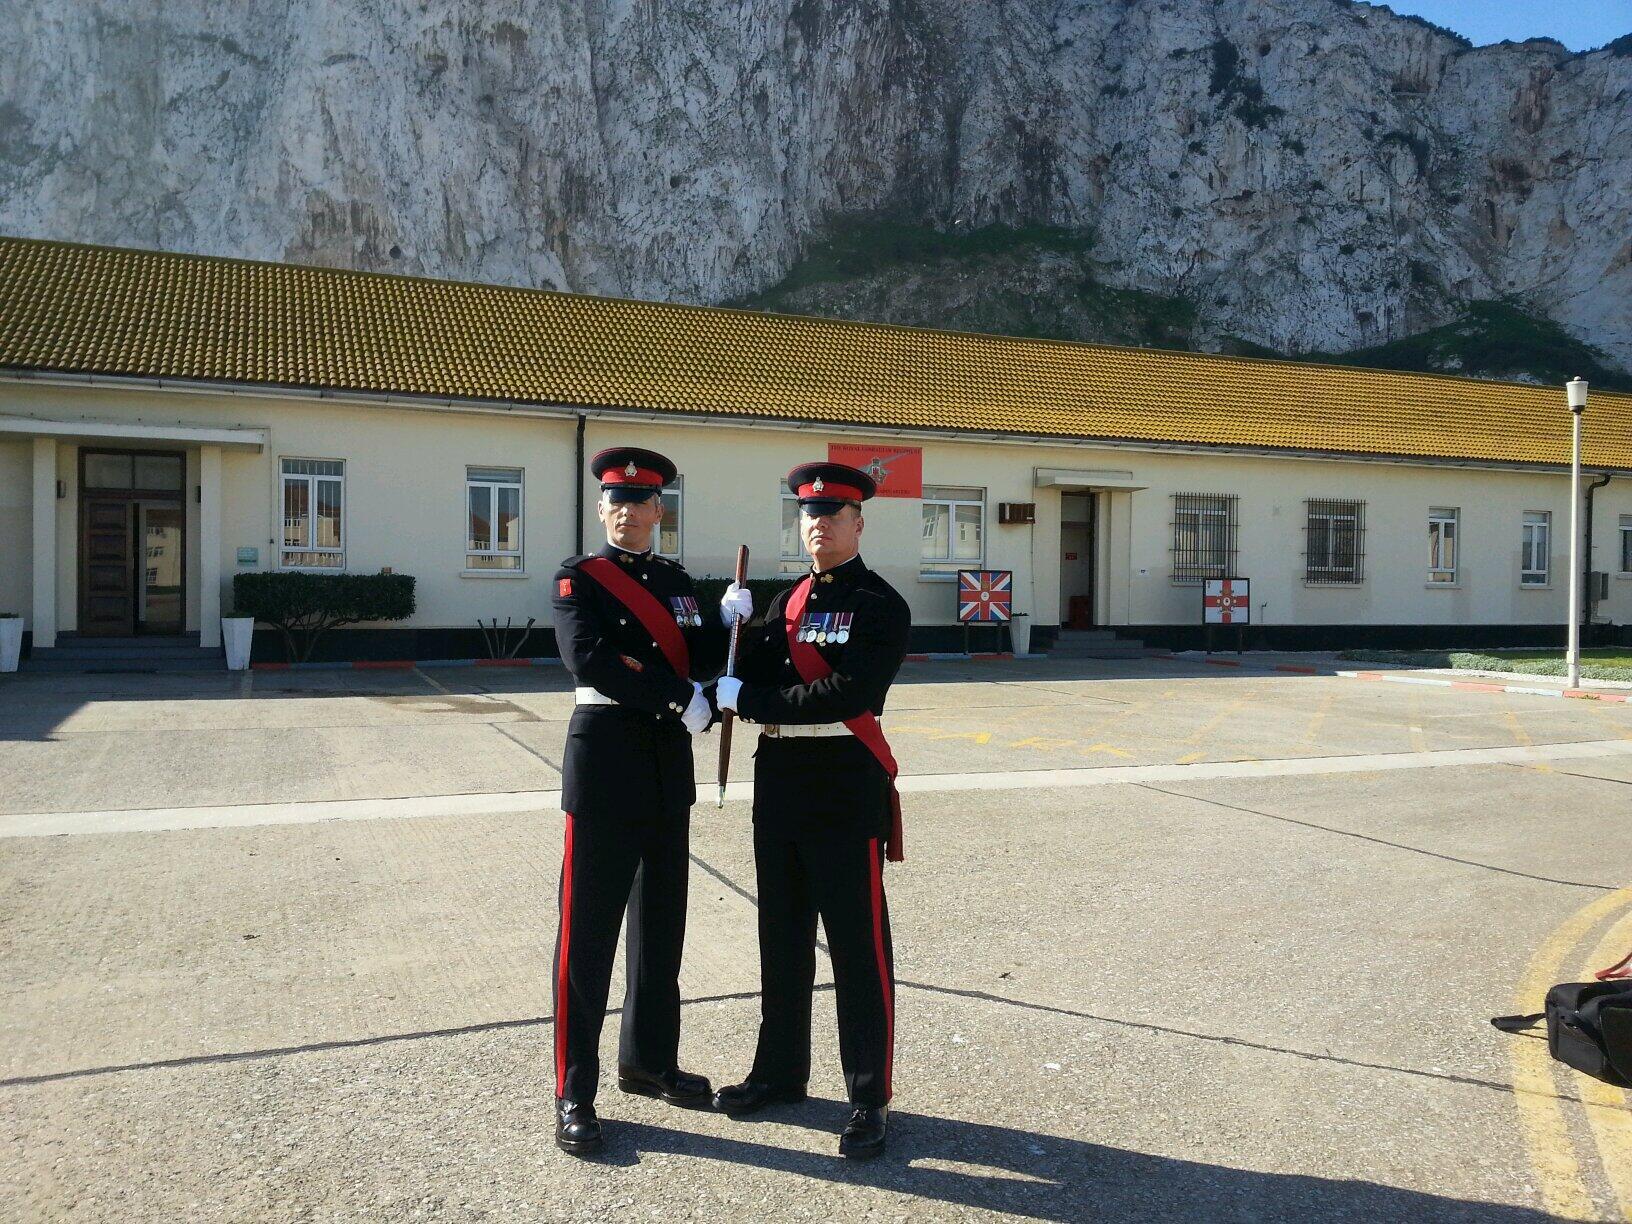 Handover of RSM @rgcareers new RSM WO1 Valverde #Gibraltar http://t.co/DipFayHxJQ